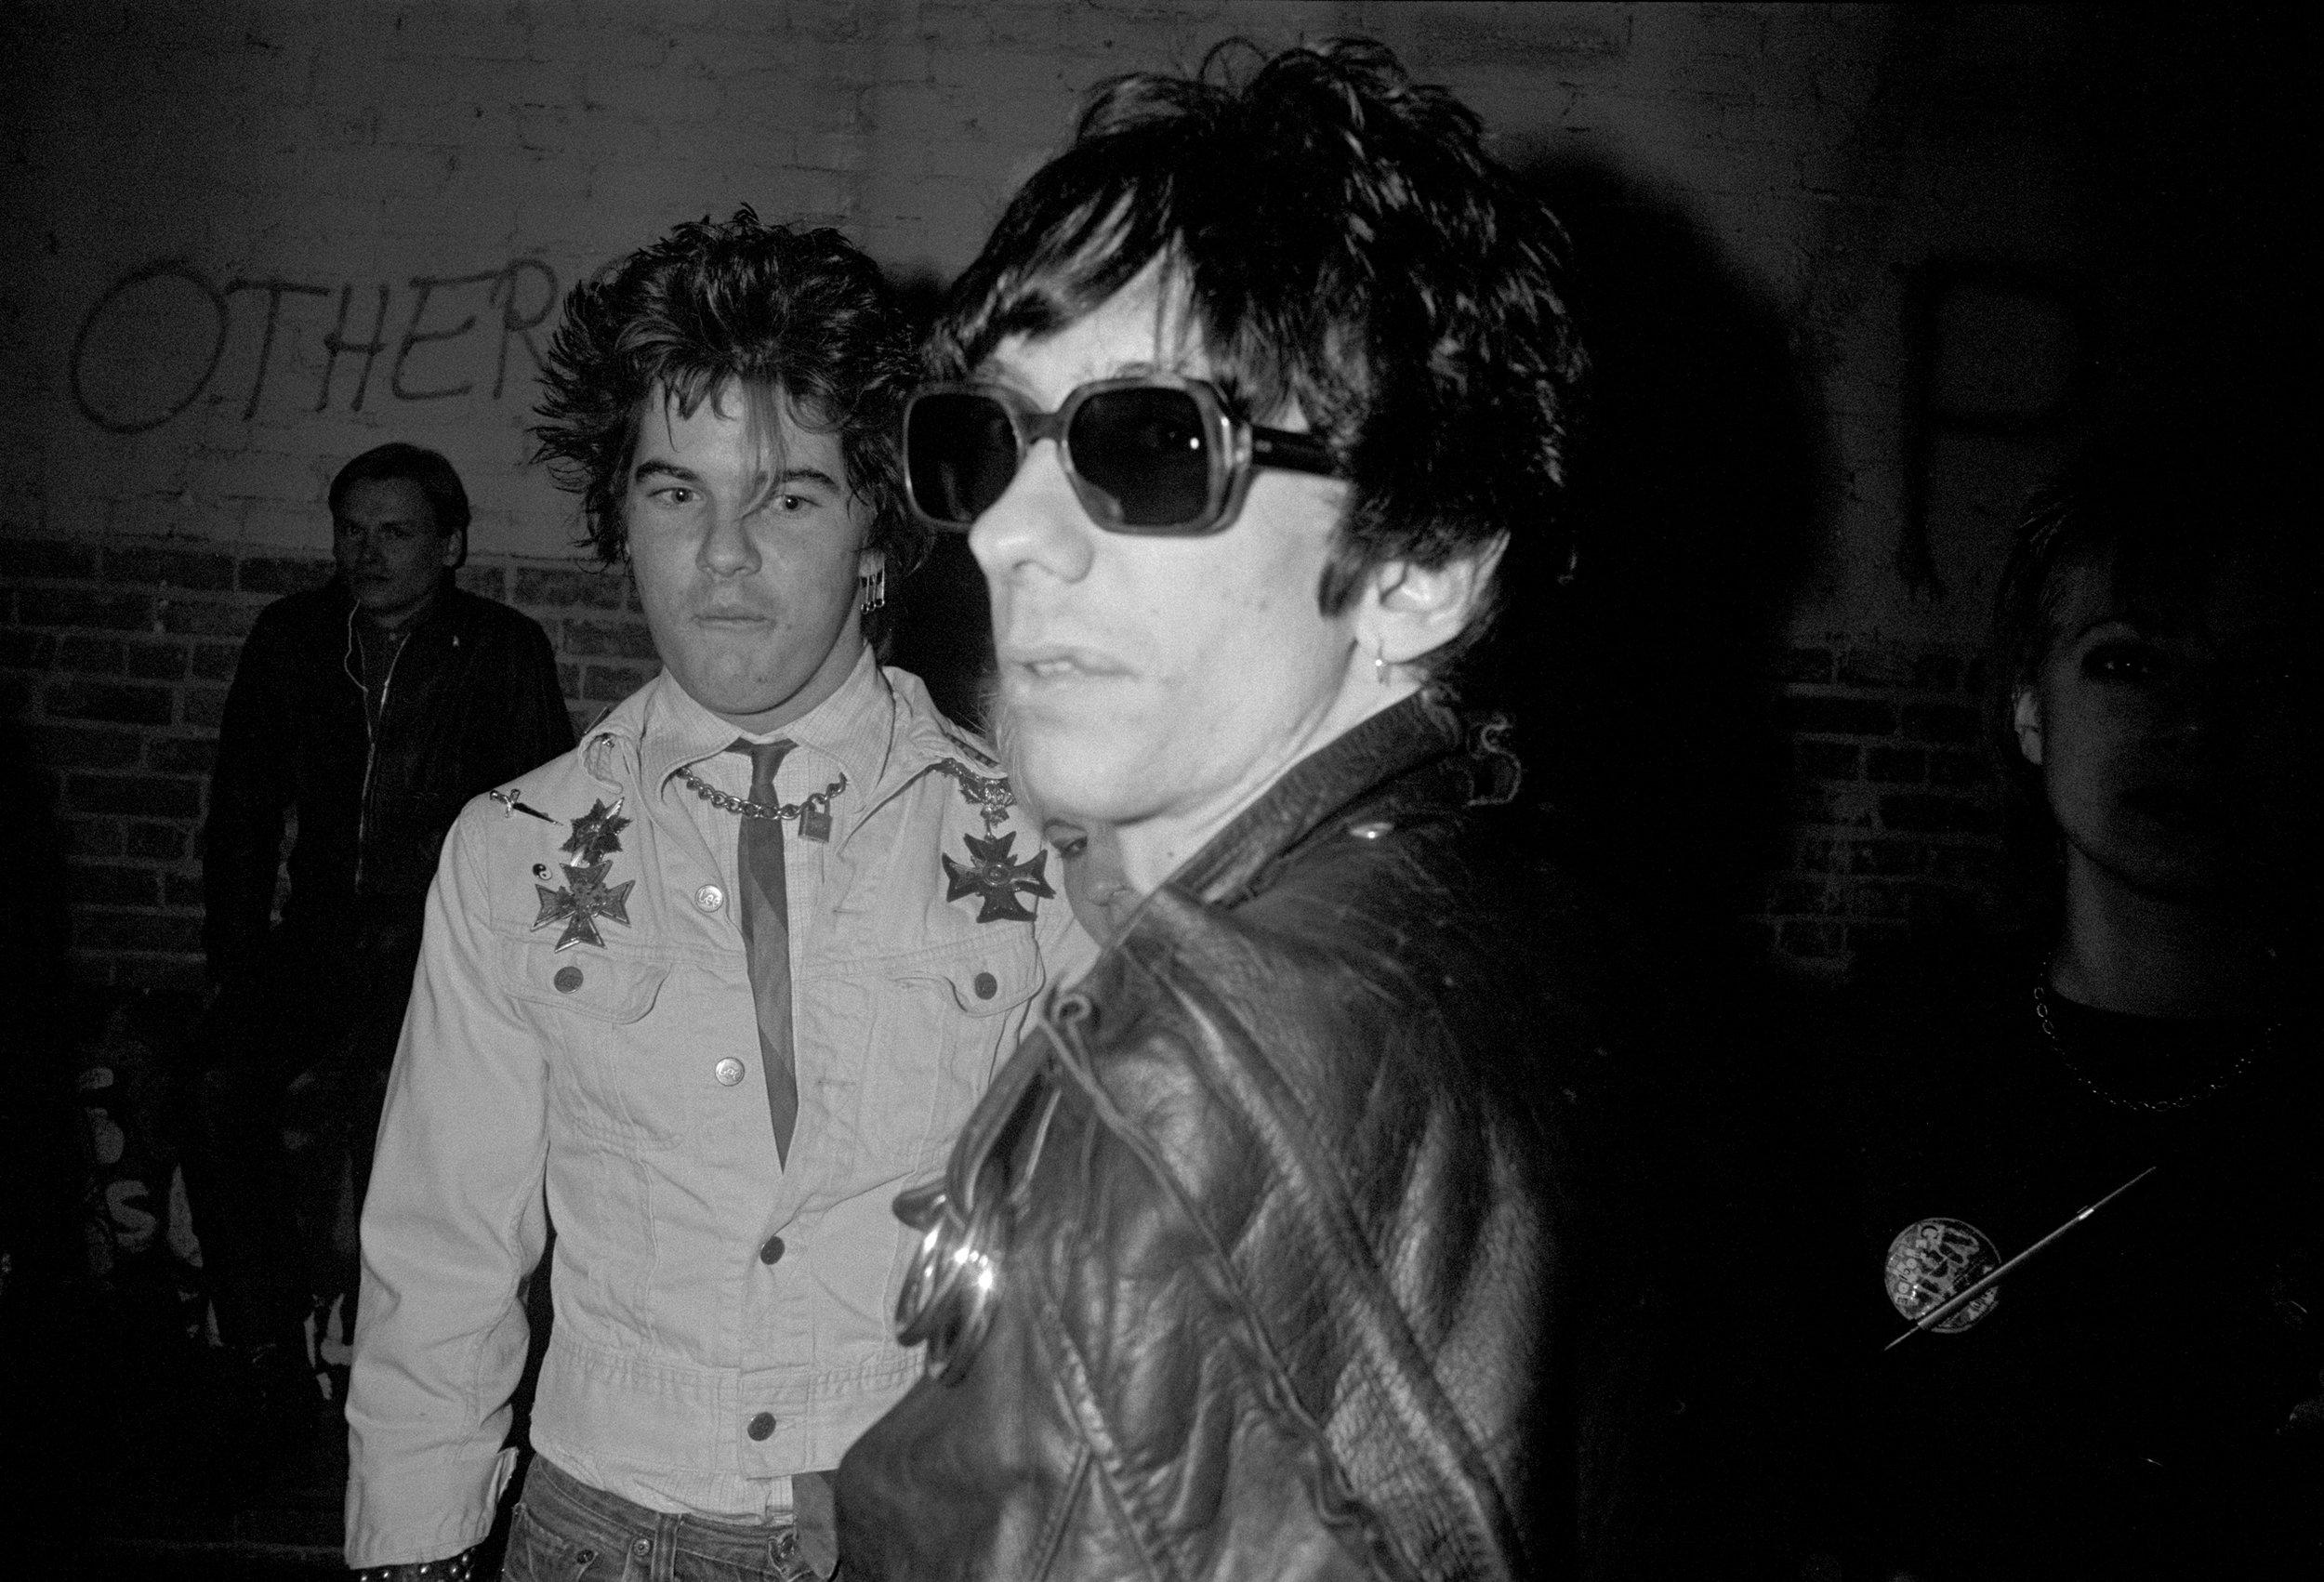 Darby Crash (Germs) and Stiv Bators (The Dead Boys), 1978/79. Photo: Melanie Nissen.